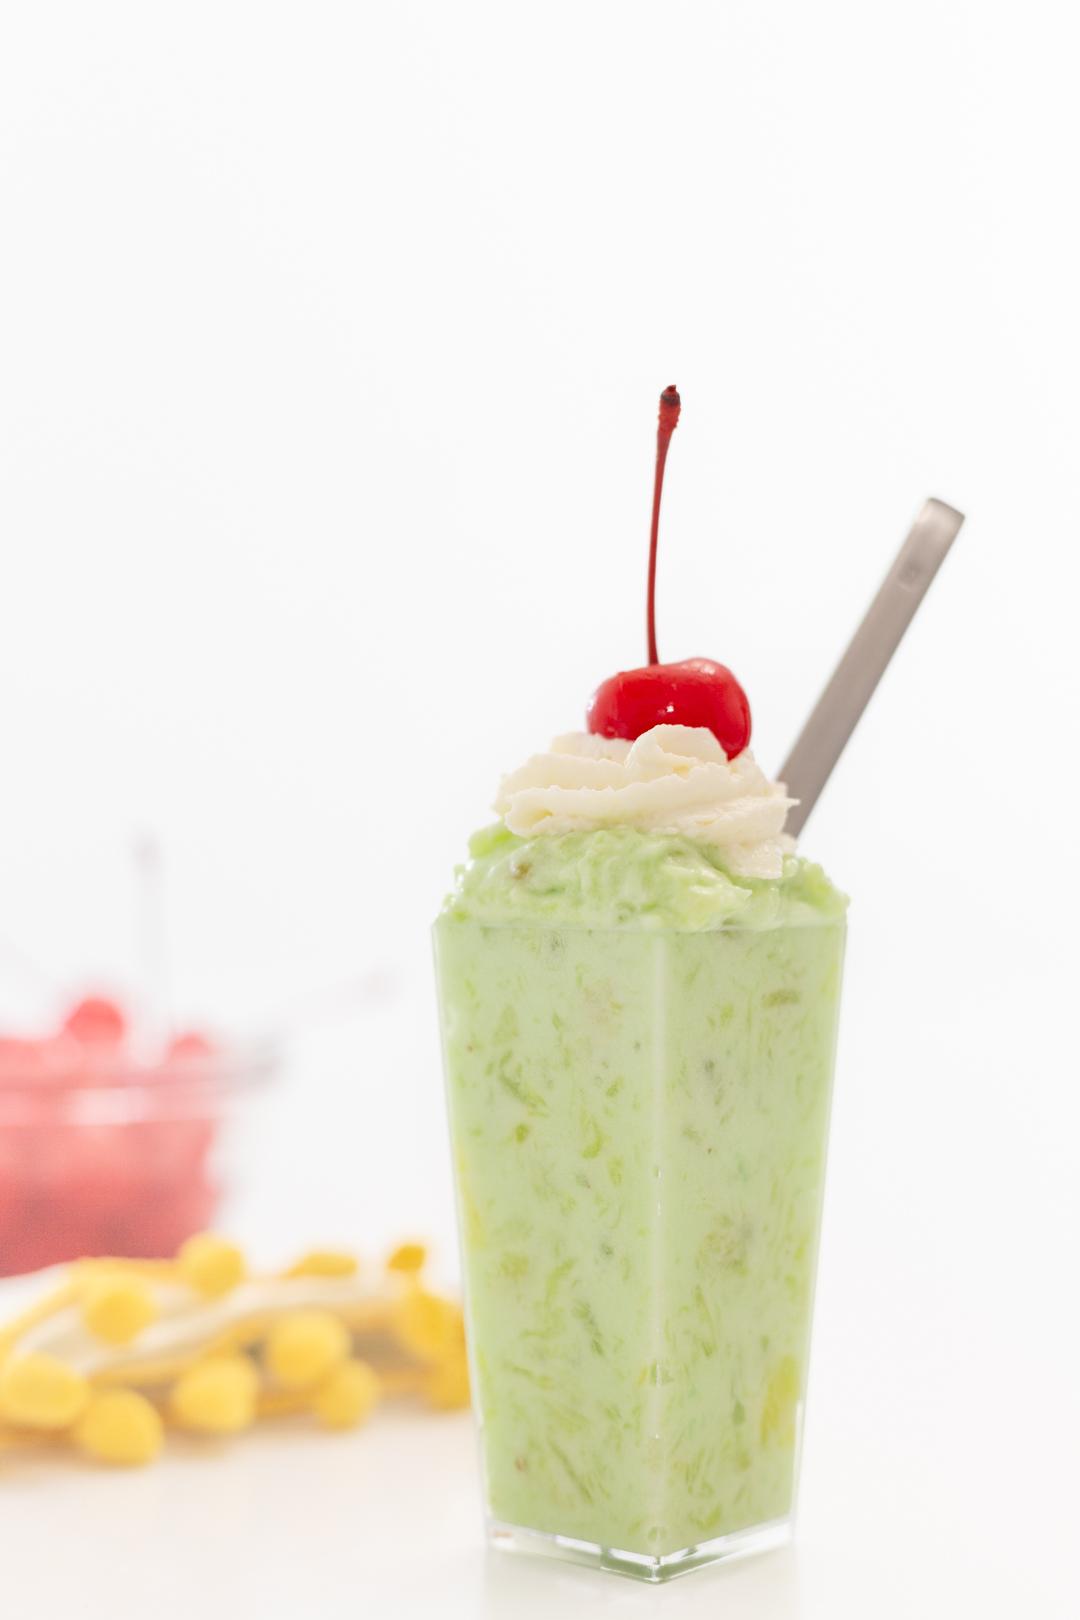 pistachio dessert with cherry on top